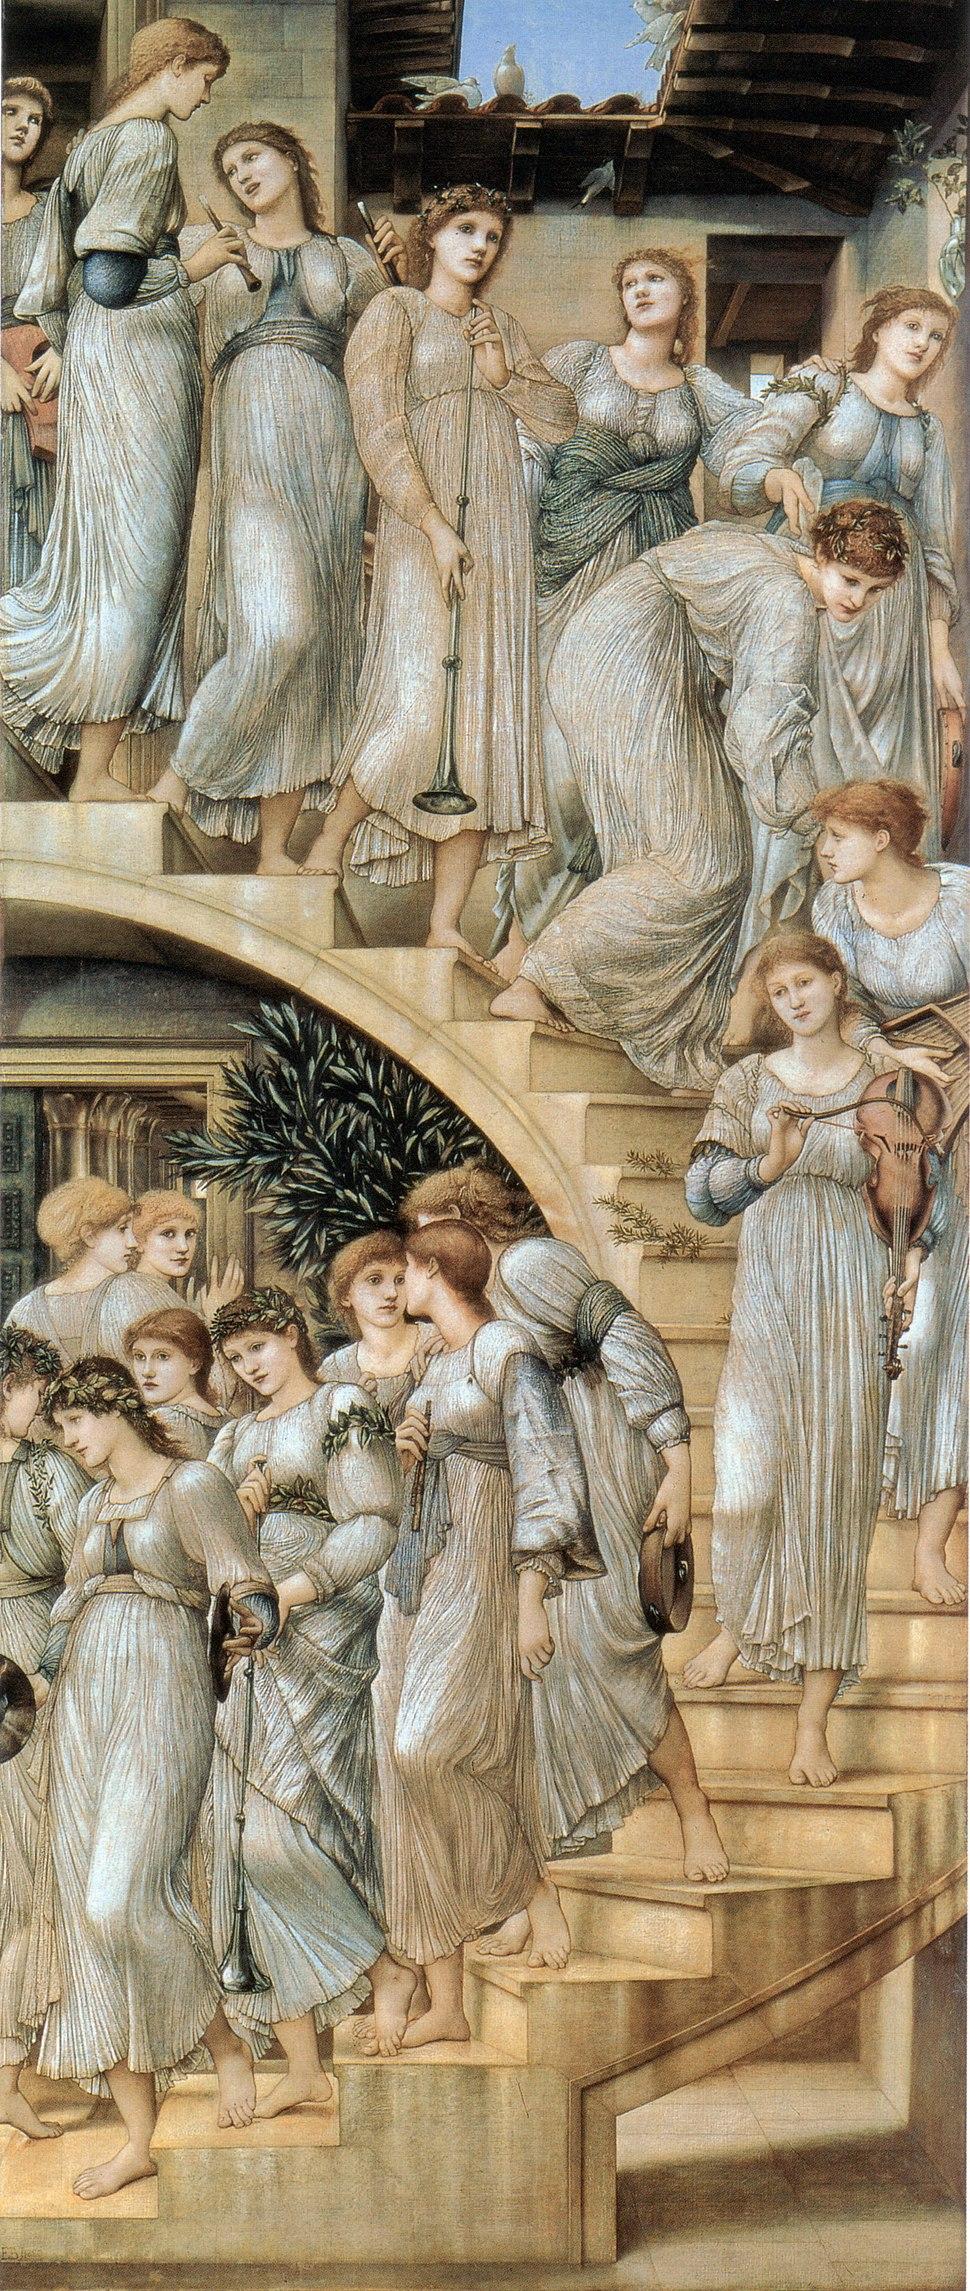 Edward Burne-Jones The Golden Stairs